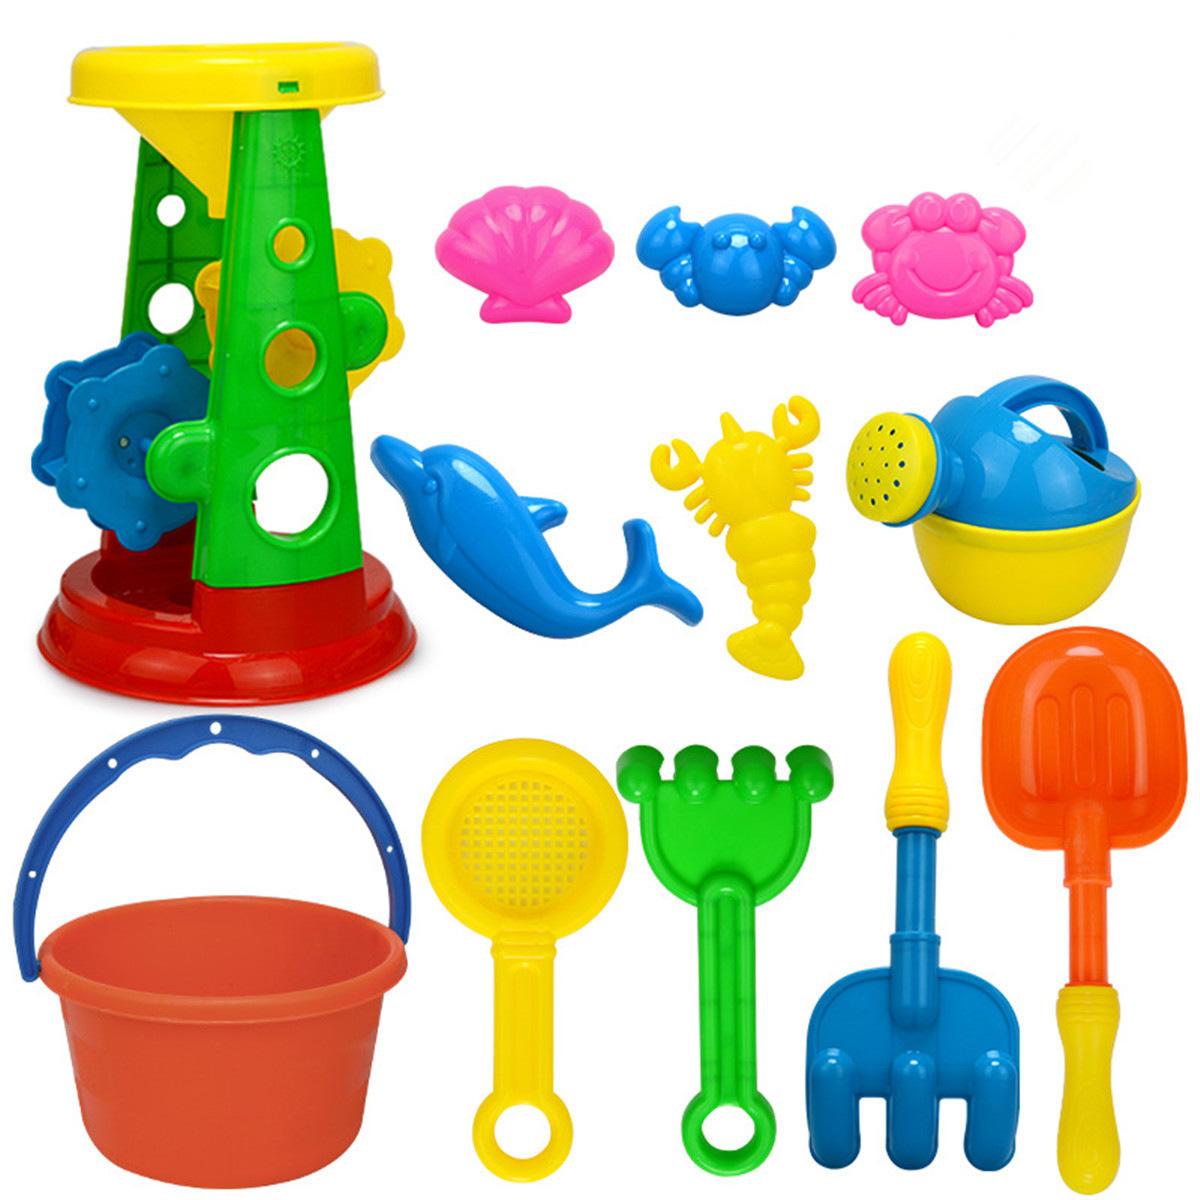 12Pcs/Set Summer Beach Sand Play Toys Sand Water Toys Kids Seaside Bucket Shovel Rake Kit Play Toys